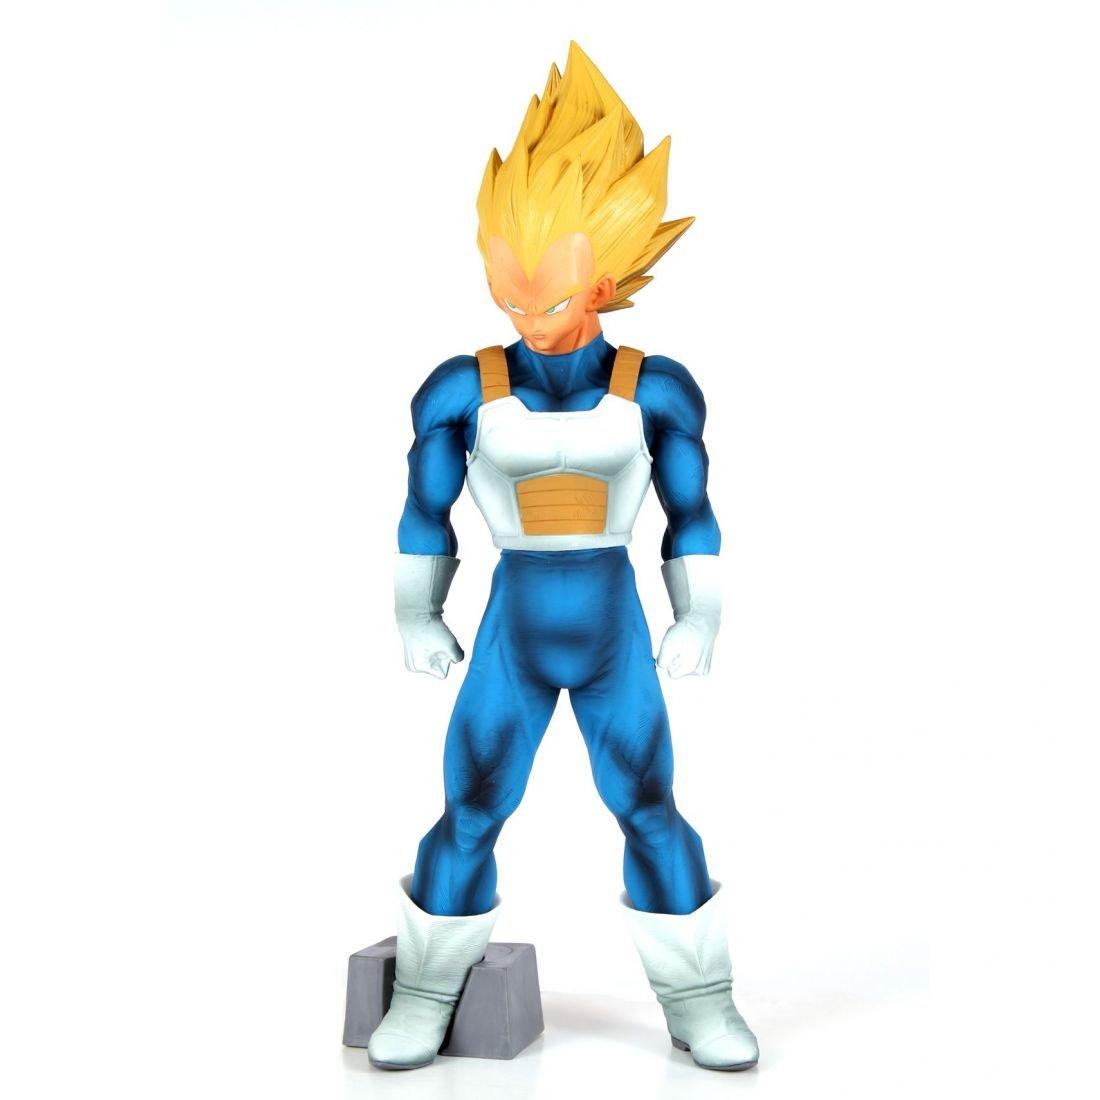 BANPRESTO 25960 – Super Master Star Piece Dragon Ball Z The Vegeta Figur, 30 cm